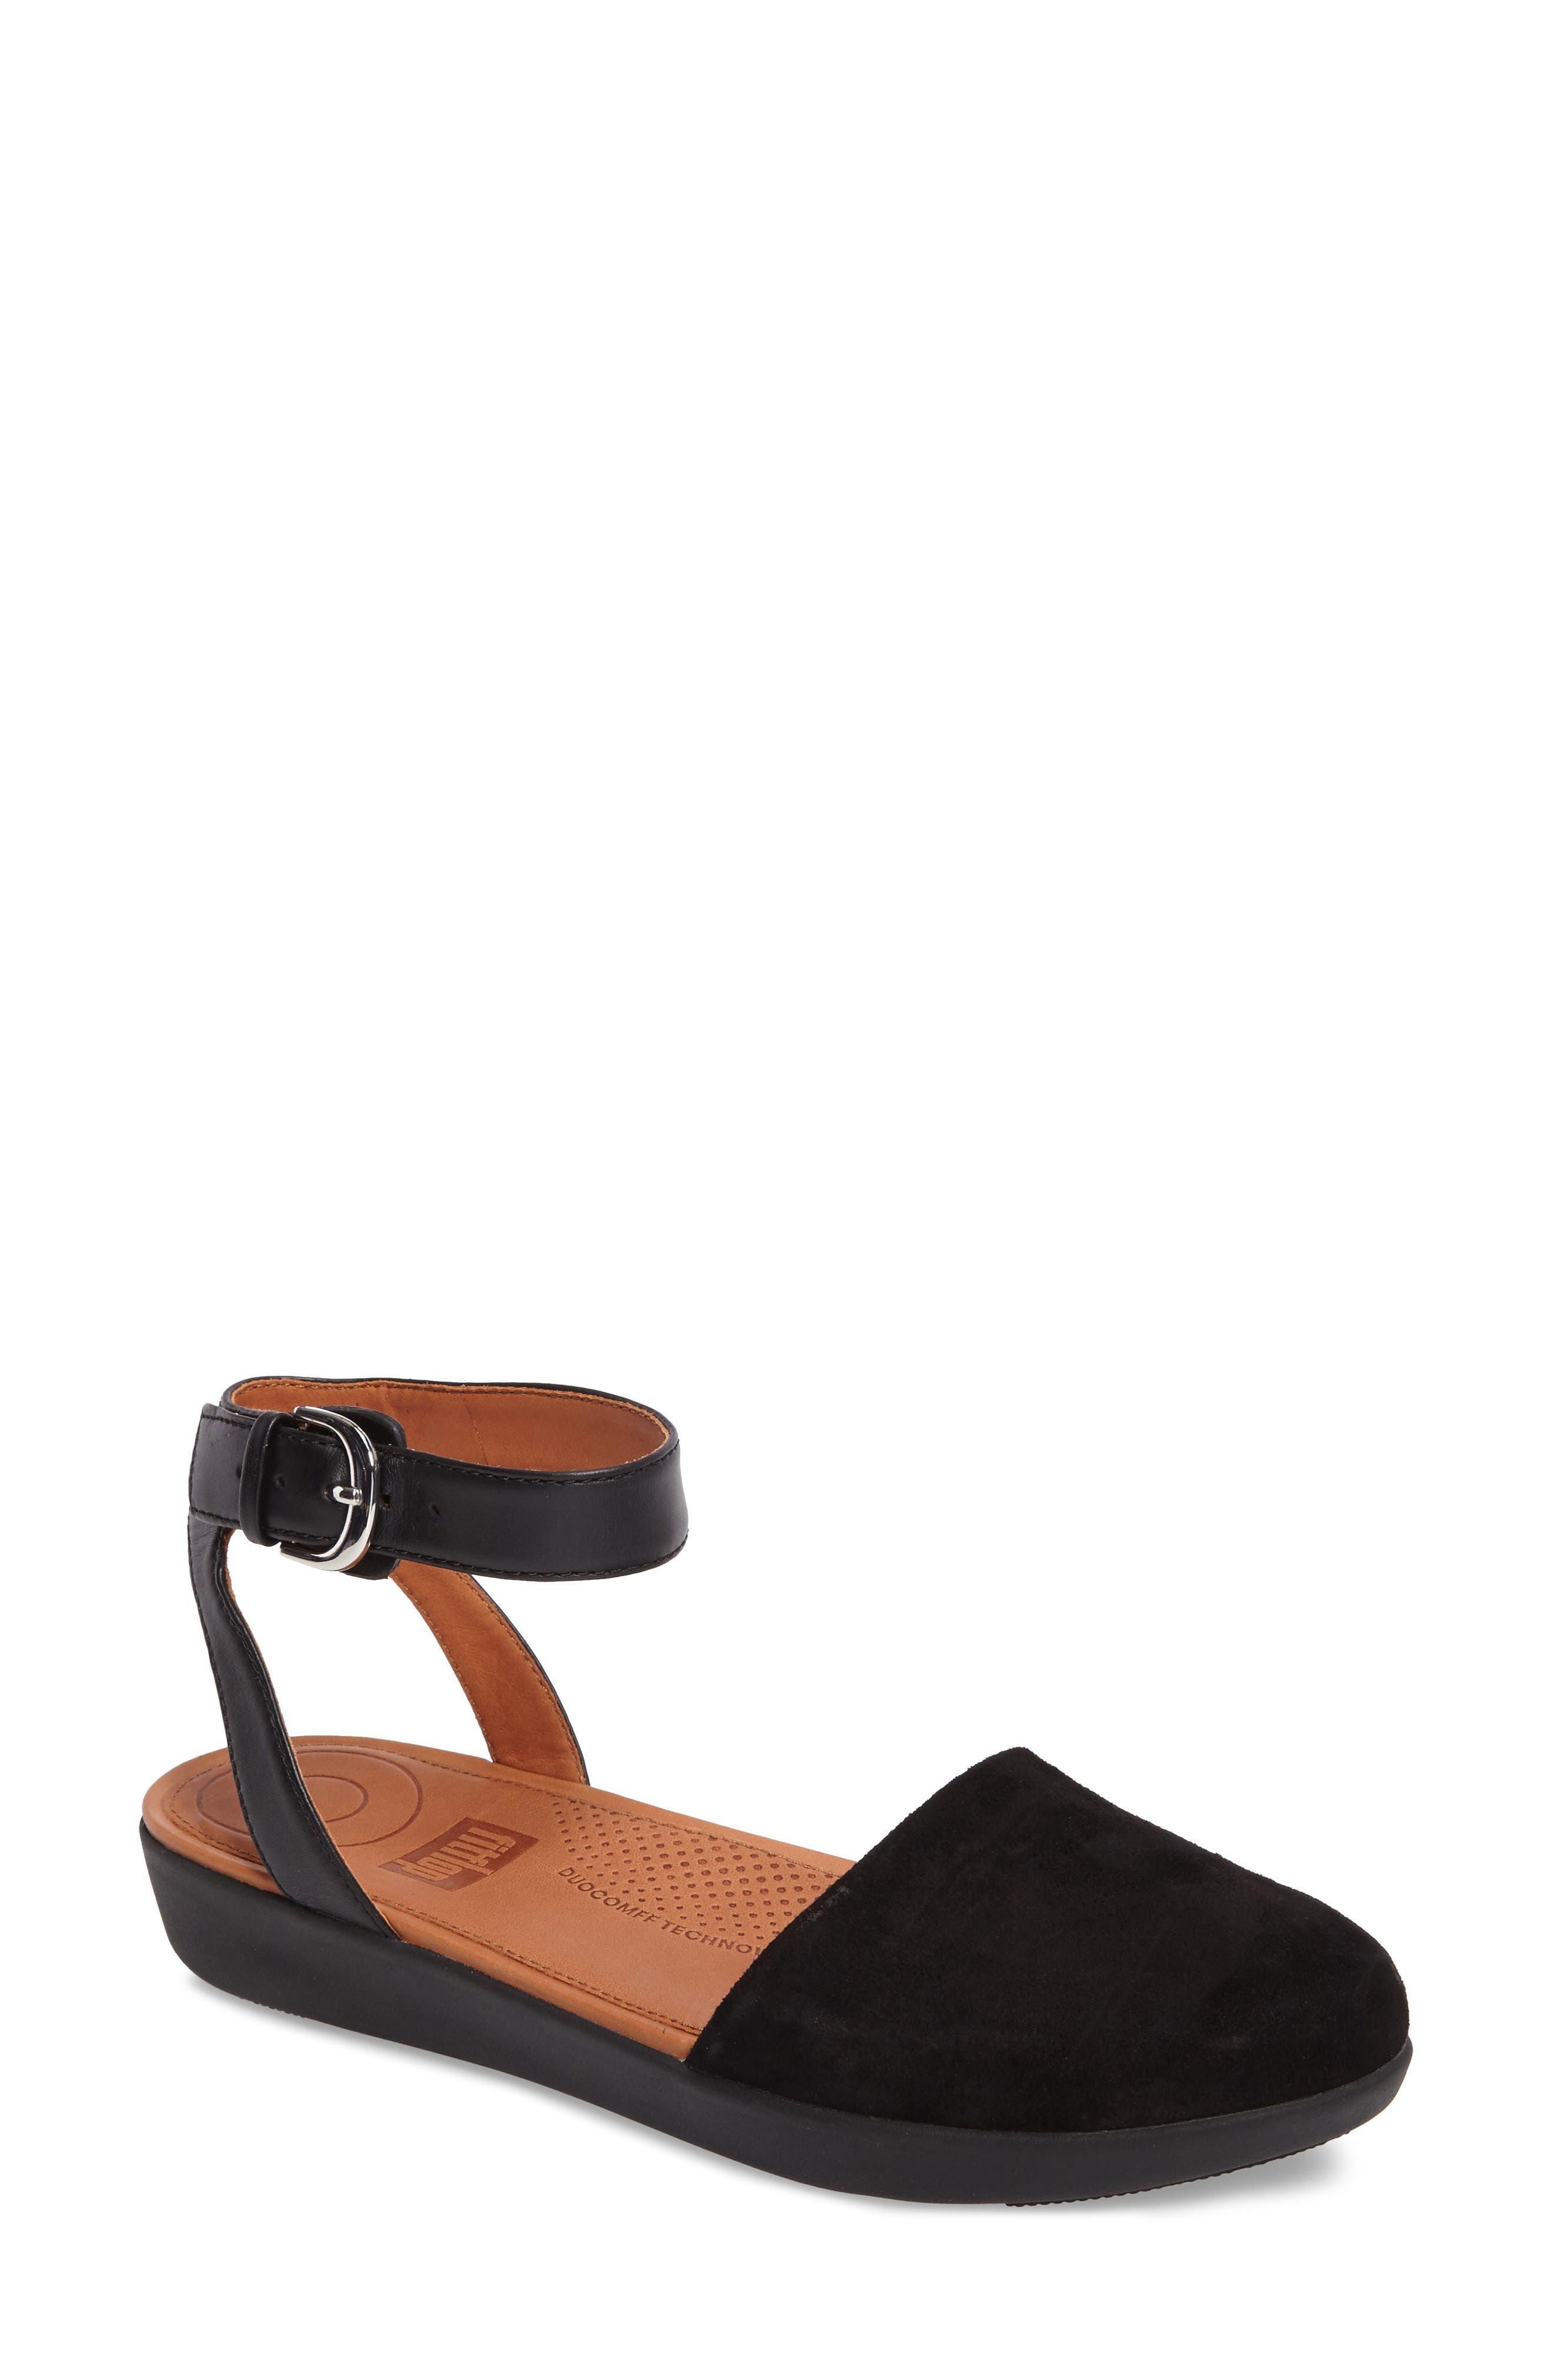 Cova Ankle Strap Sandal, Main, color, 001